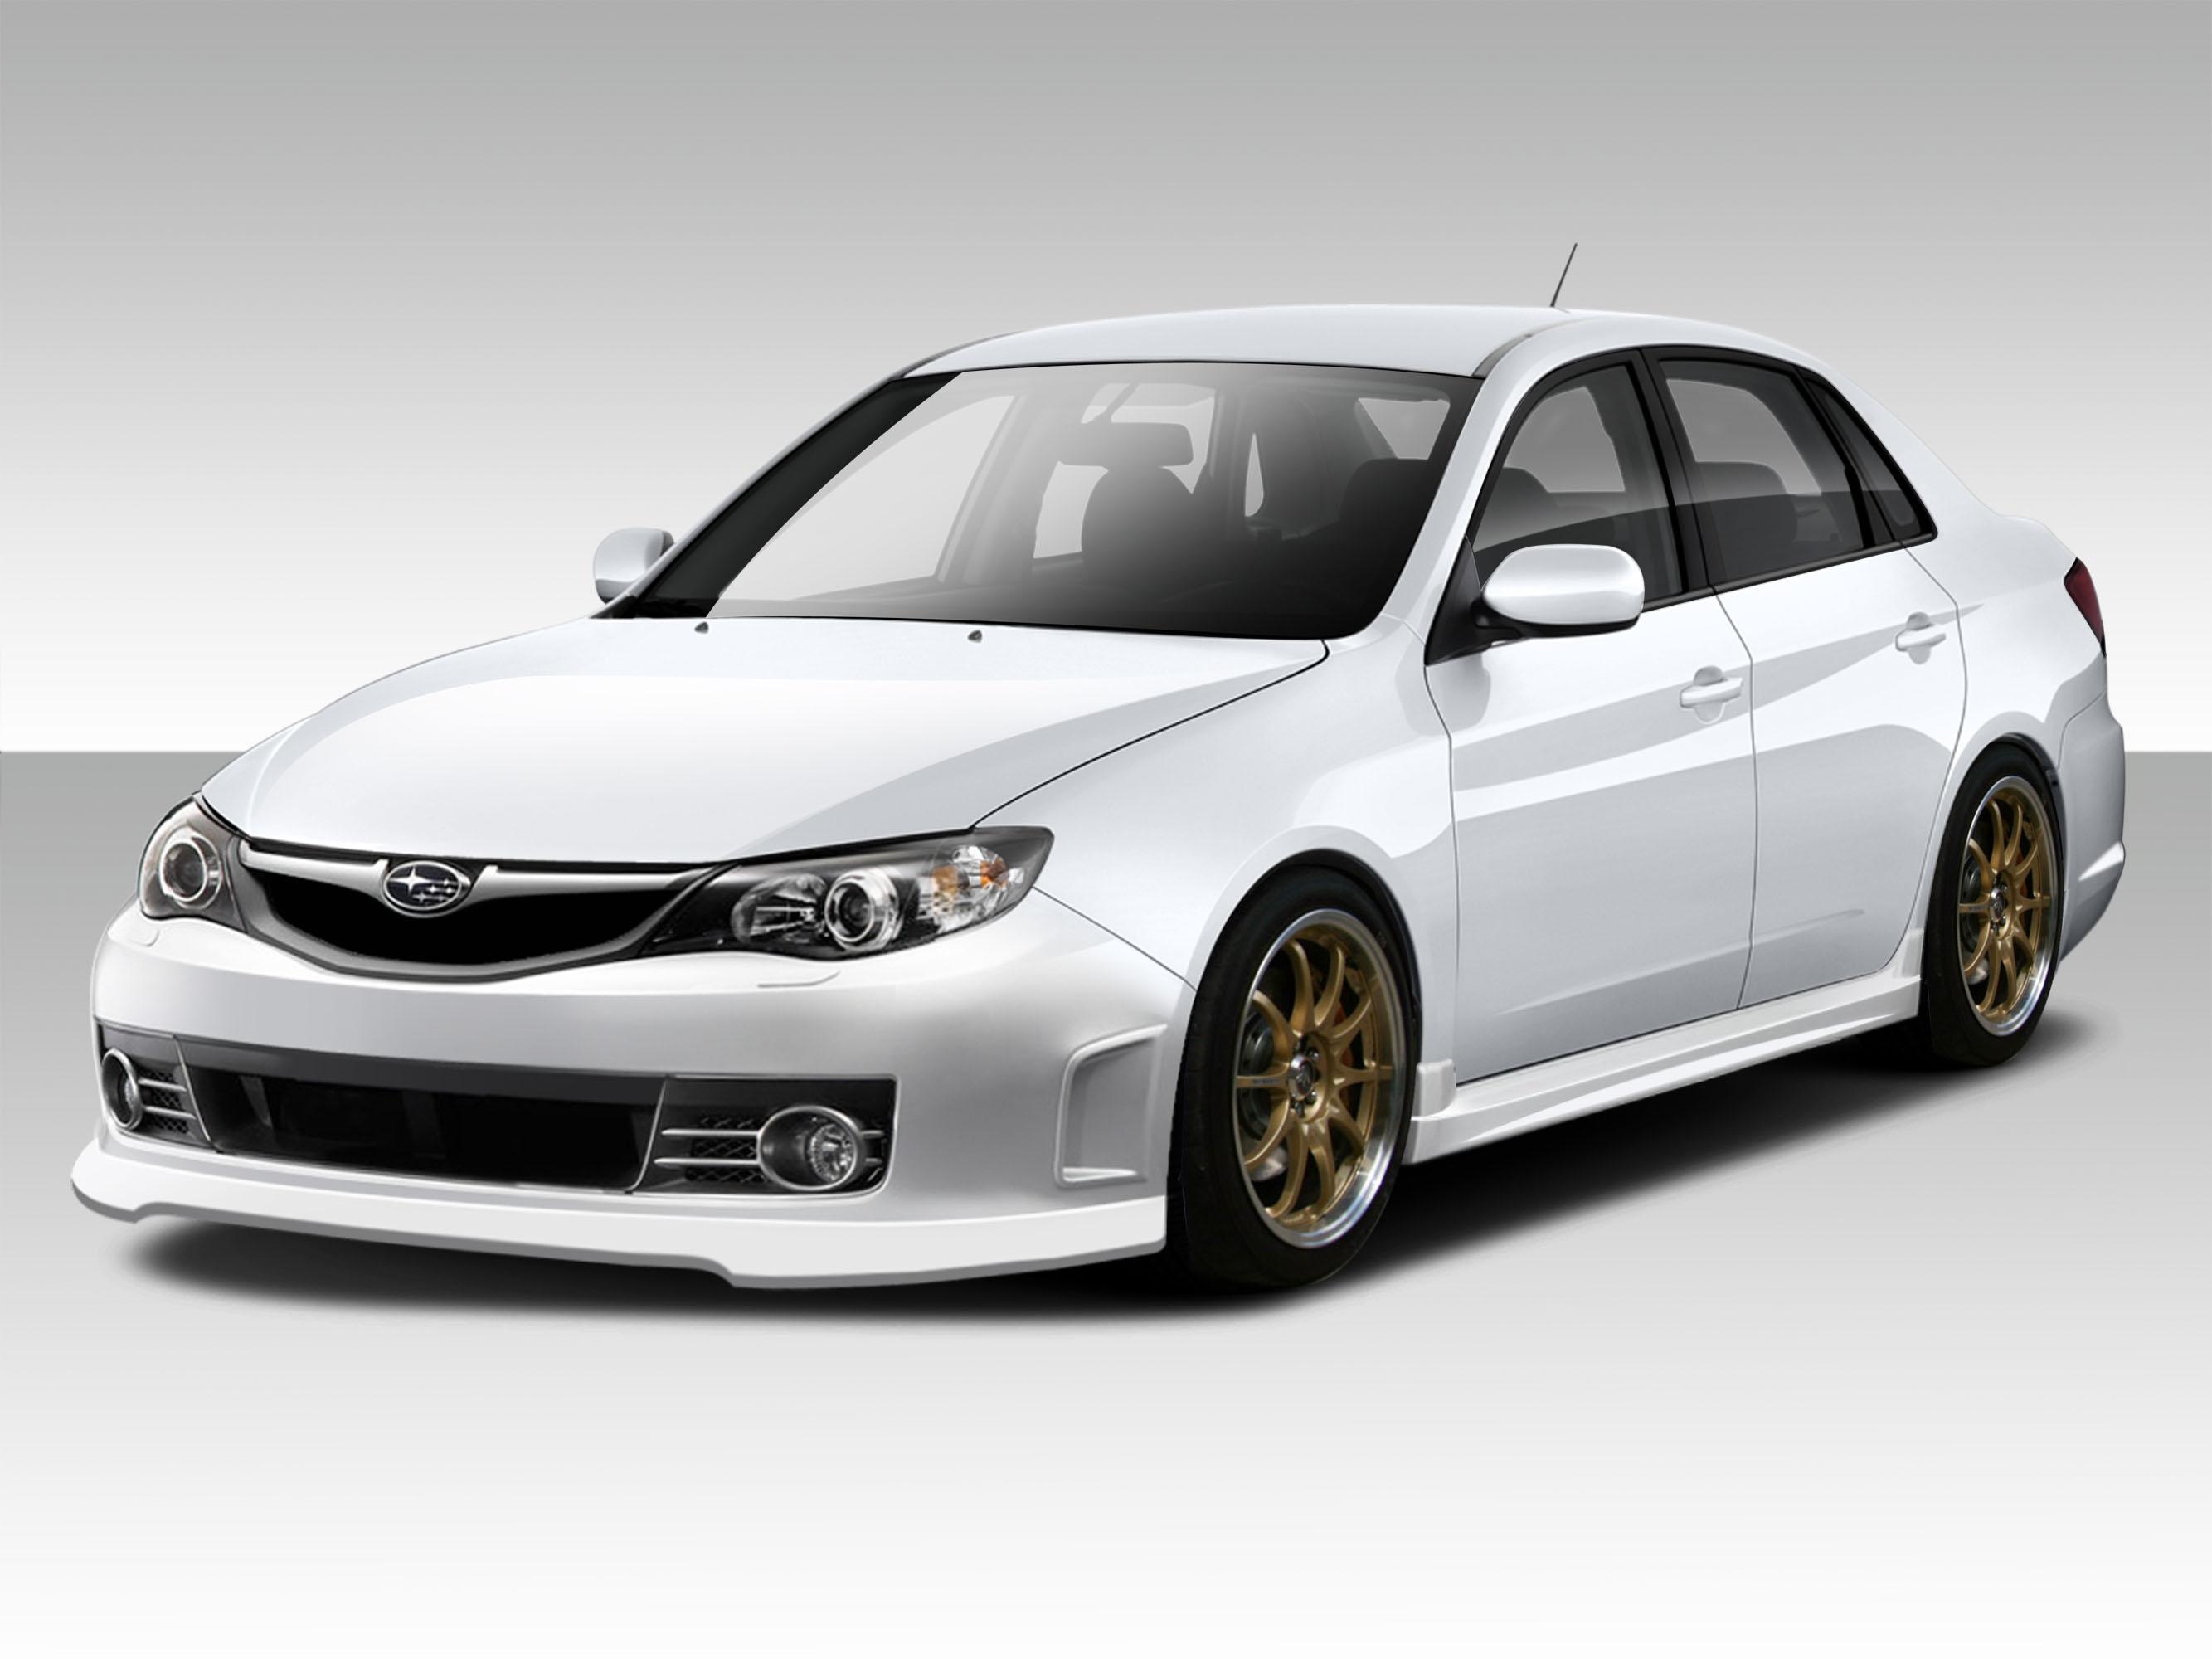 Subaru Impreza 08 14 Subaru Impreza Wrx 4dr 08 10 Body